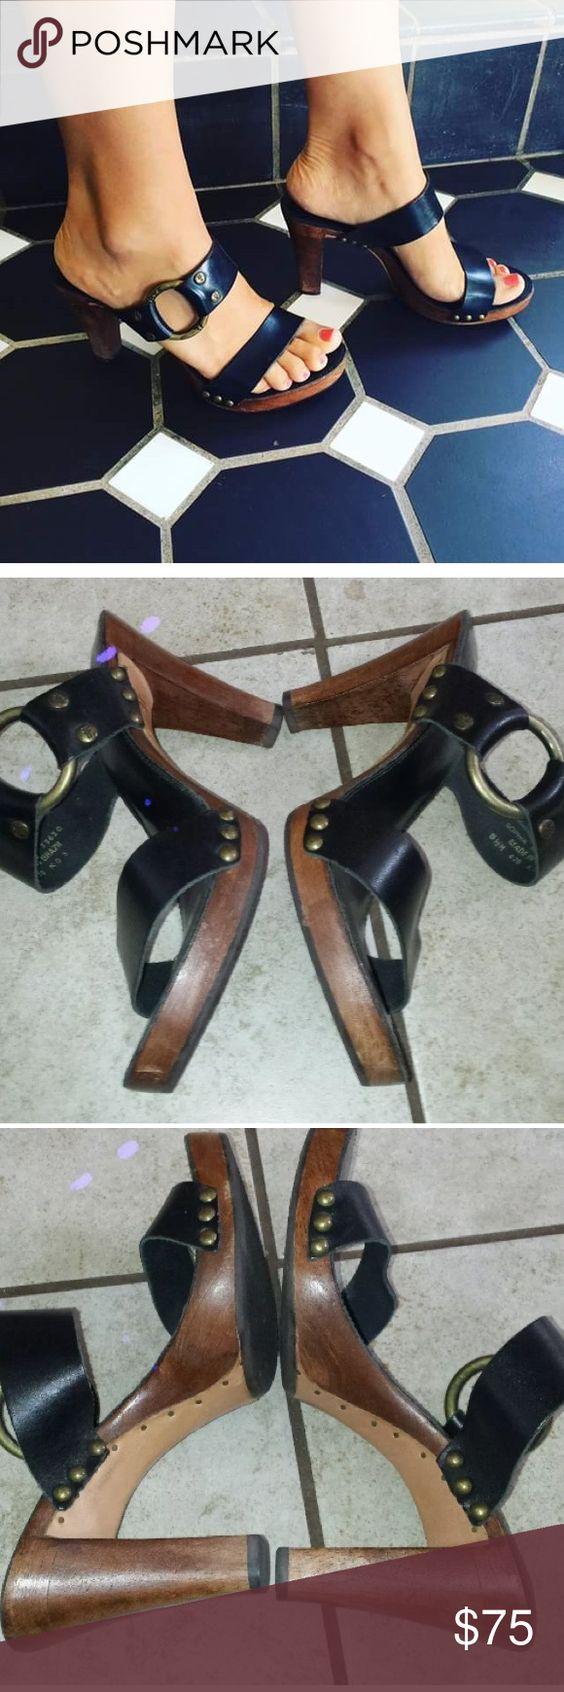 Frye sophia ring wooden heels Guc. Black leather with Wooden heel. Frye Shoes Heels